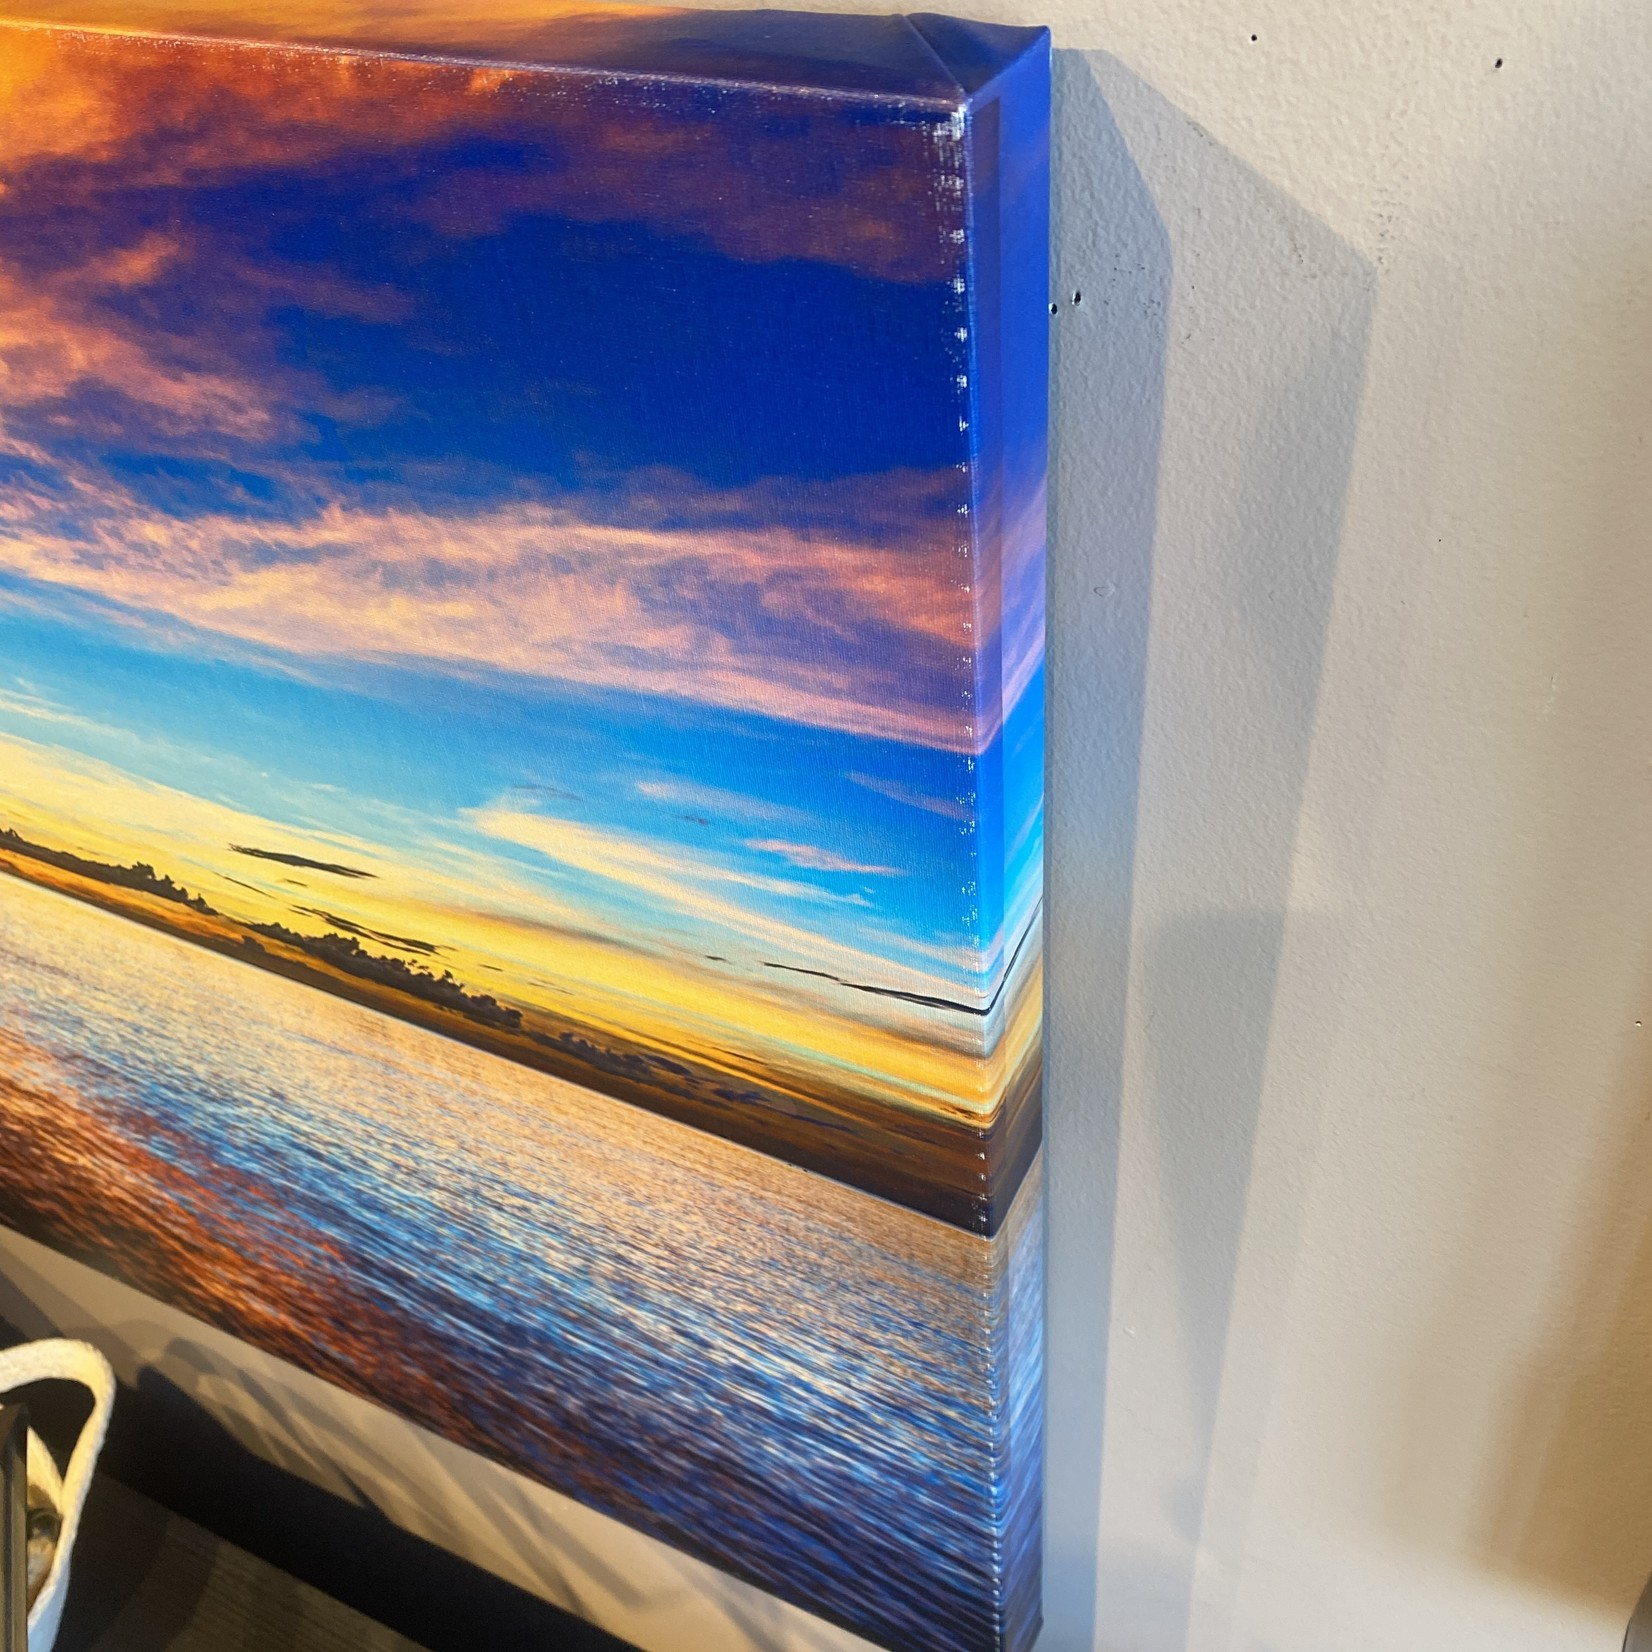 *Carribean Sunset' Photographic Print 22 x 32 - Marked Edges